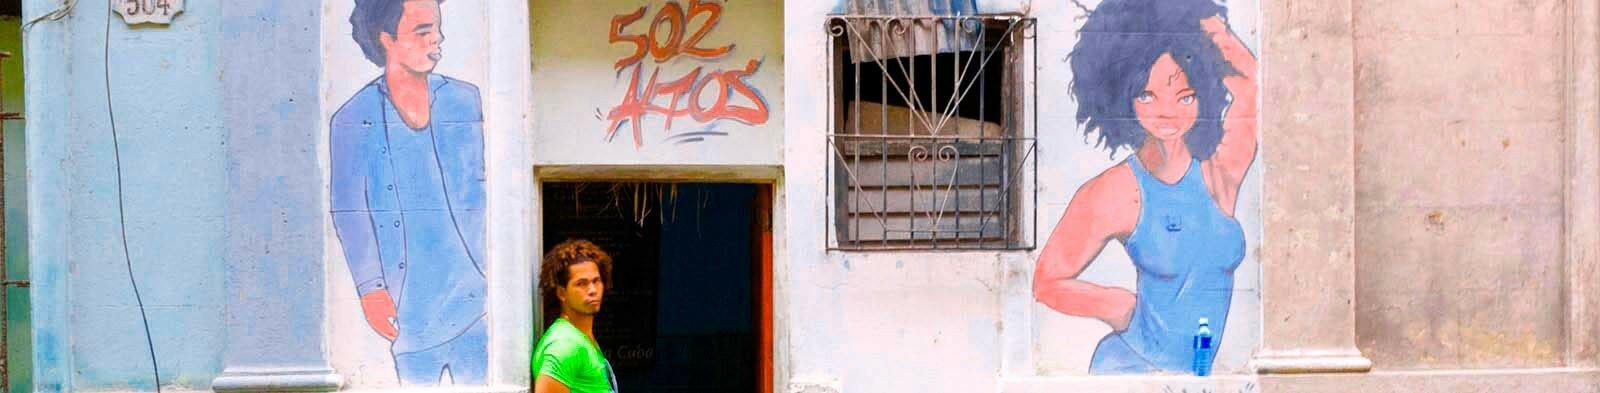 Street scene in Old Havana / Cuba